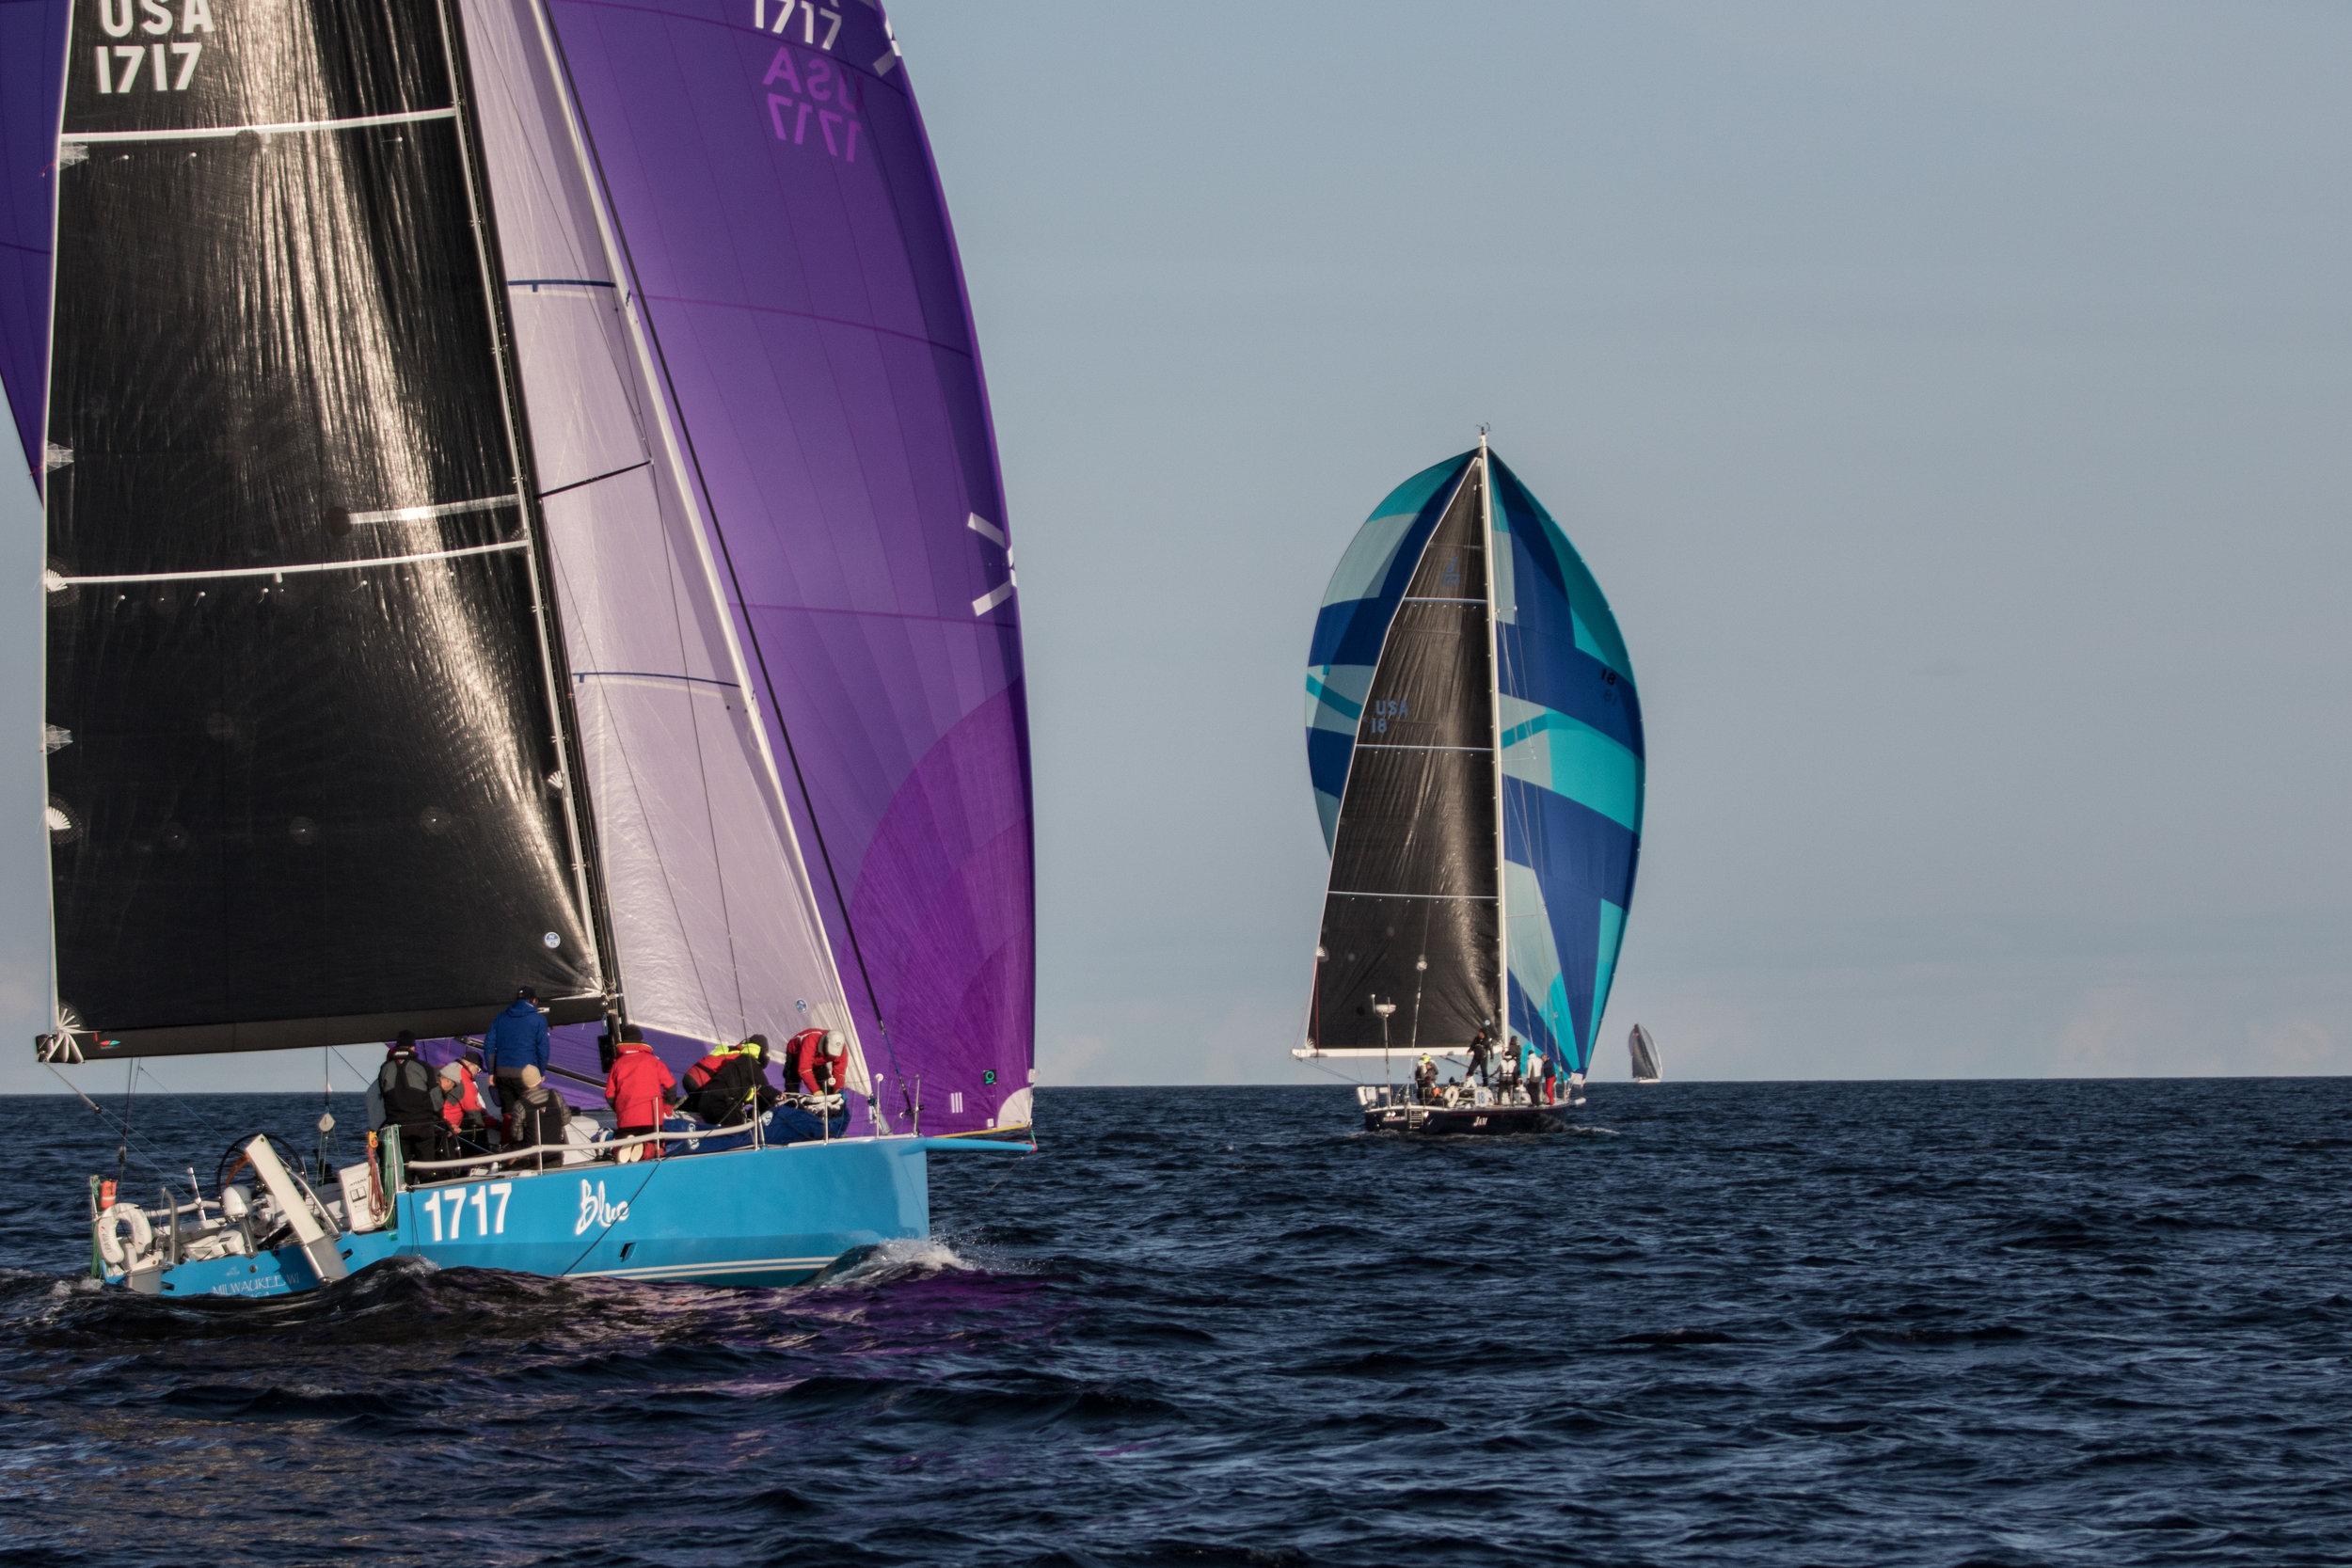 Berg-30-Mar-2018-17-16-30-1X7A5645 georgiastrait, Ocean, race, Sailing, Southernstraitsrace, Spinnaker.jpg